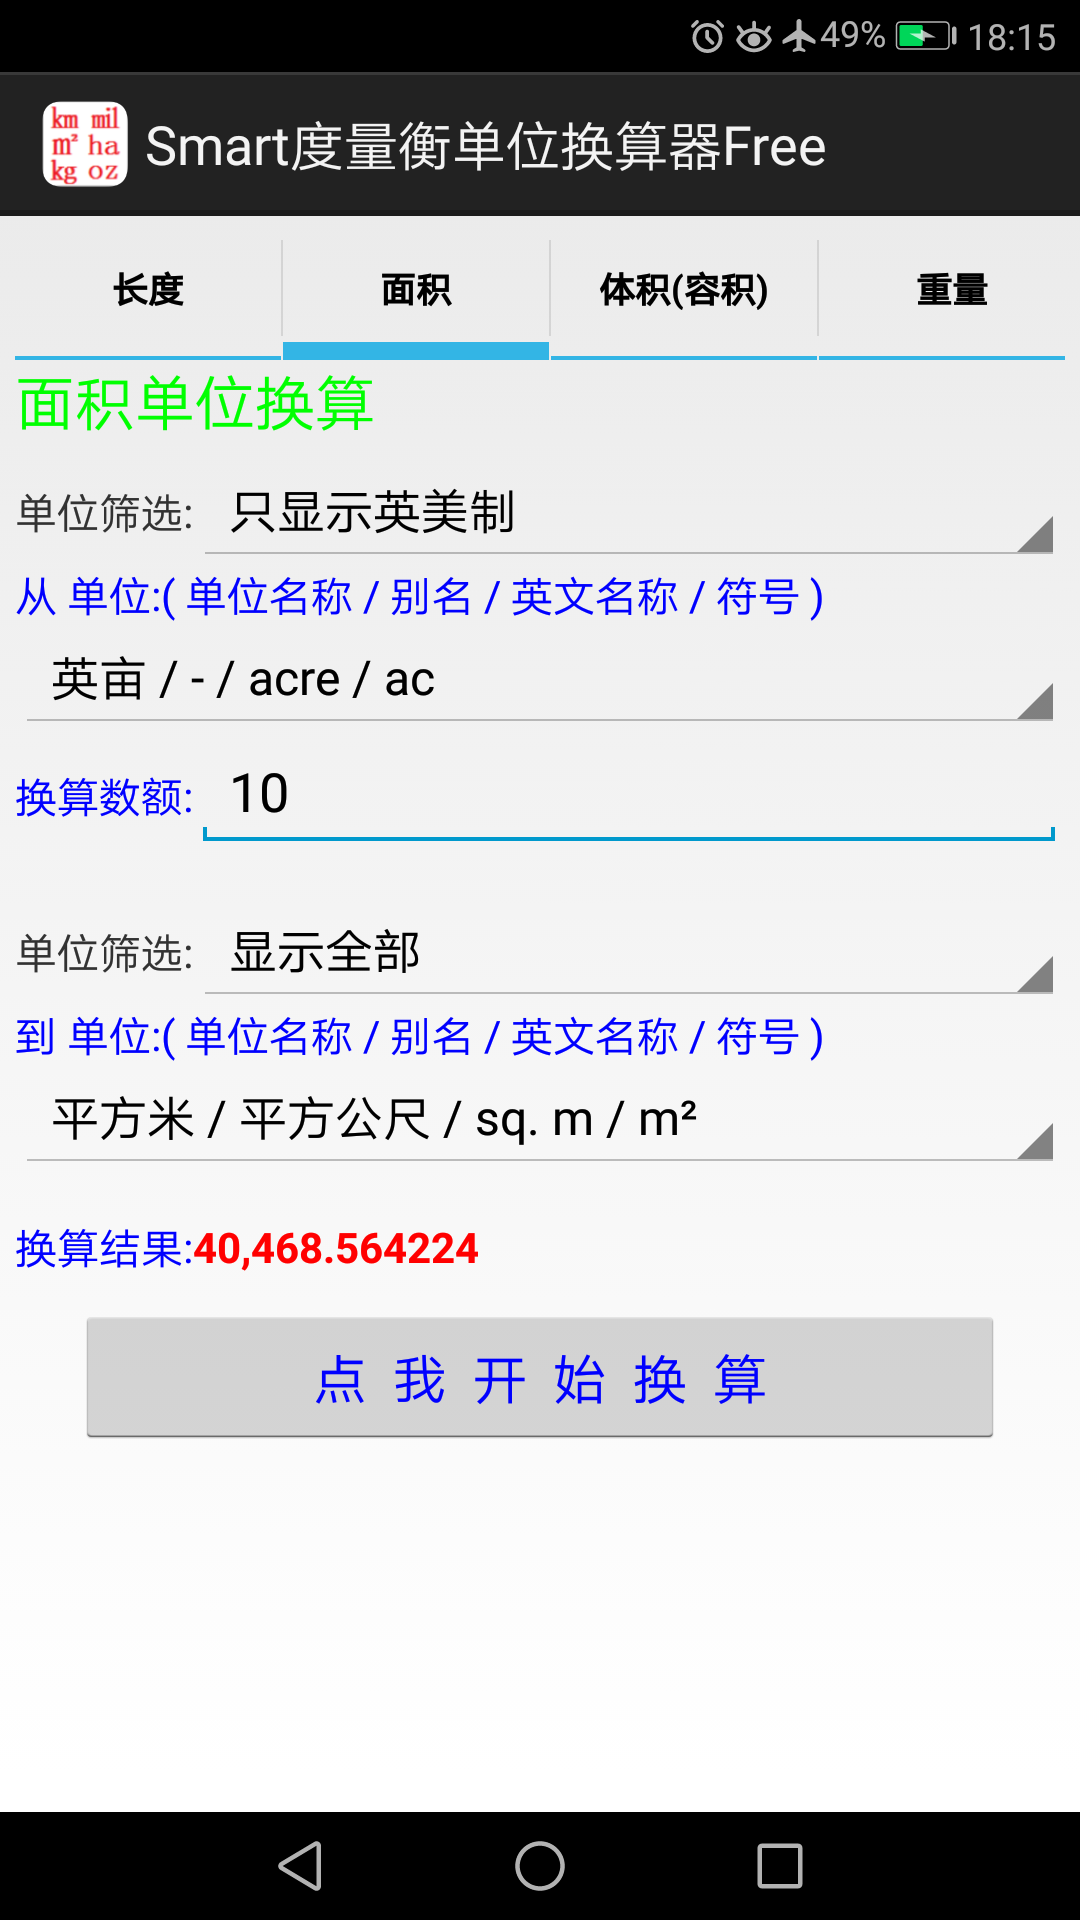 度量衡_free_ac.png